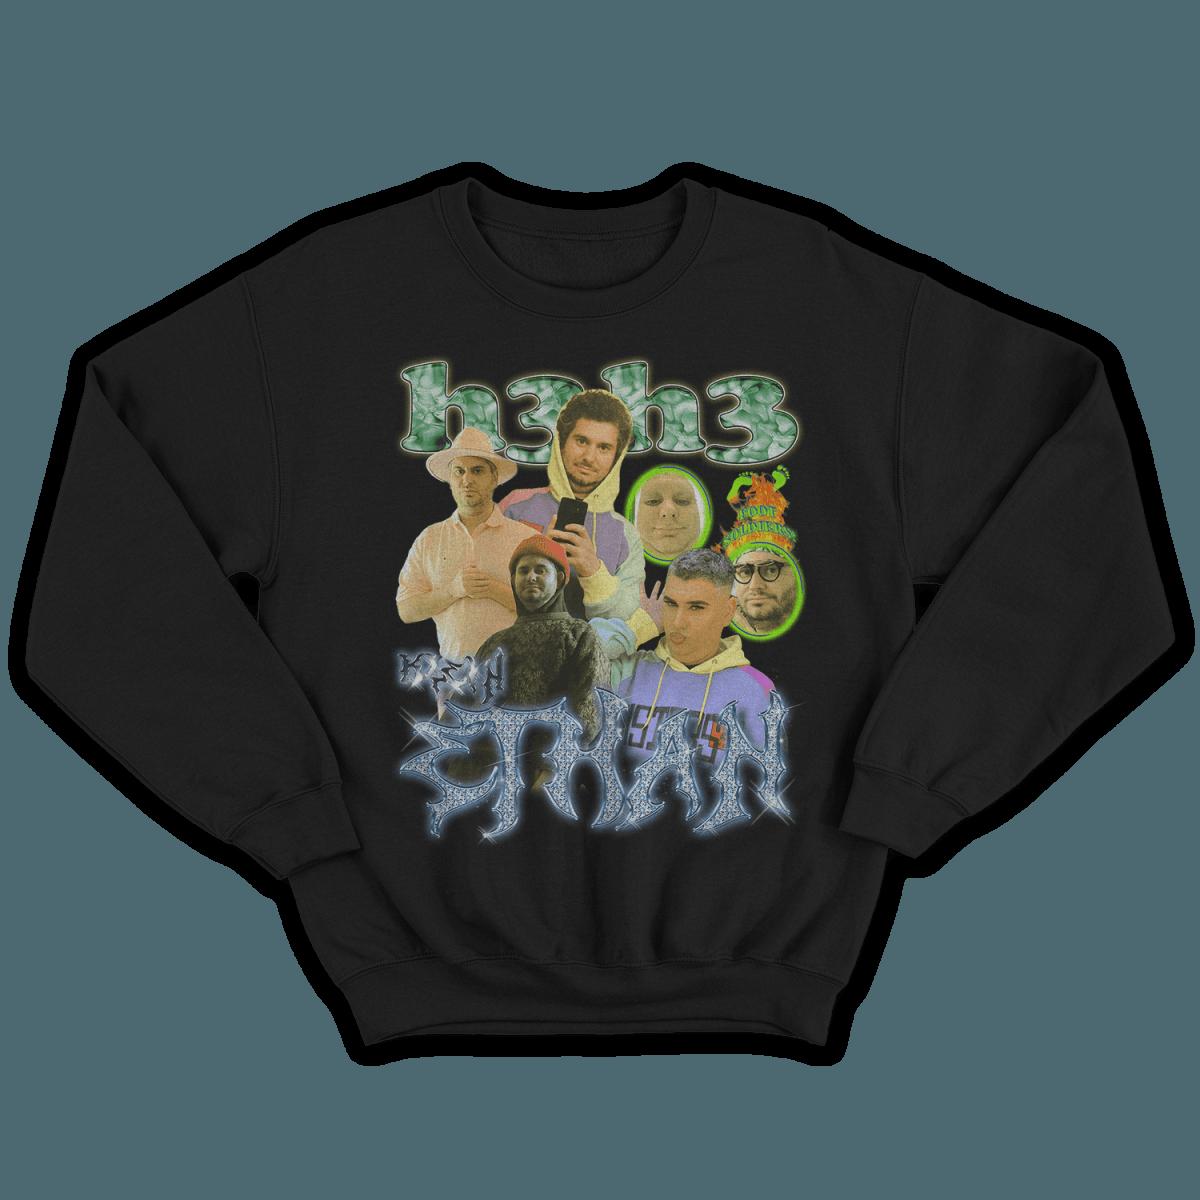 Ethan Klein Vintage Bootleg Unisex Sweater